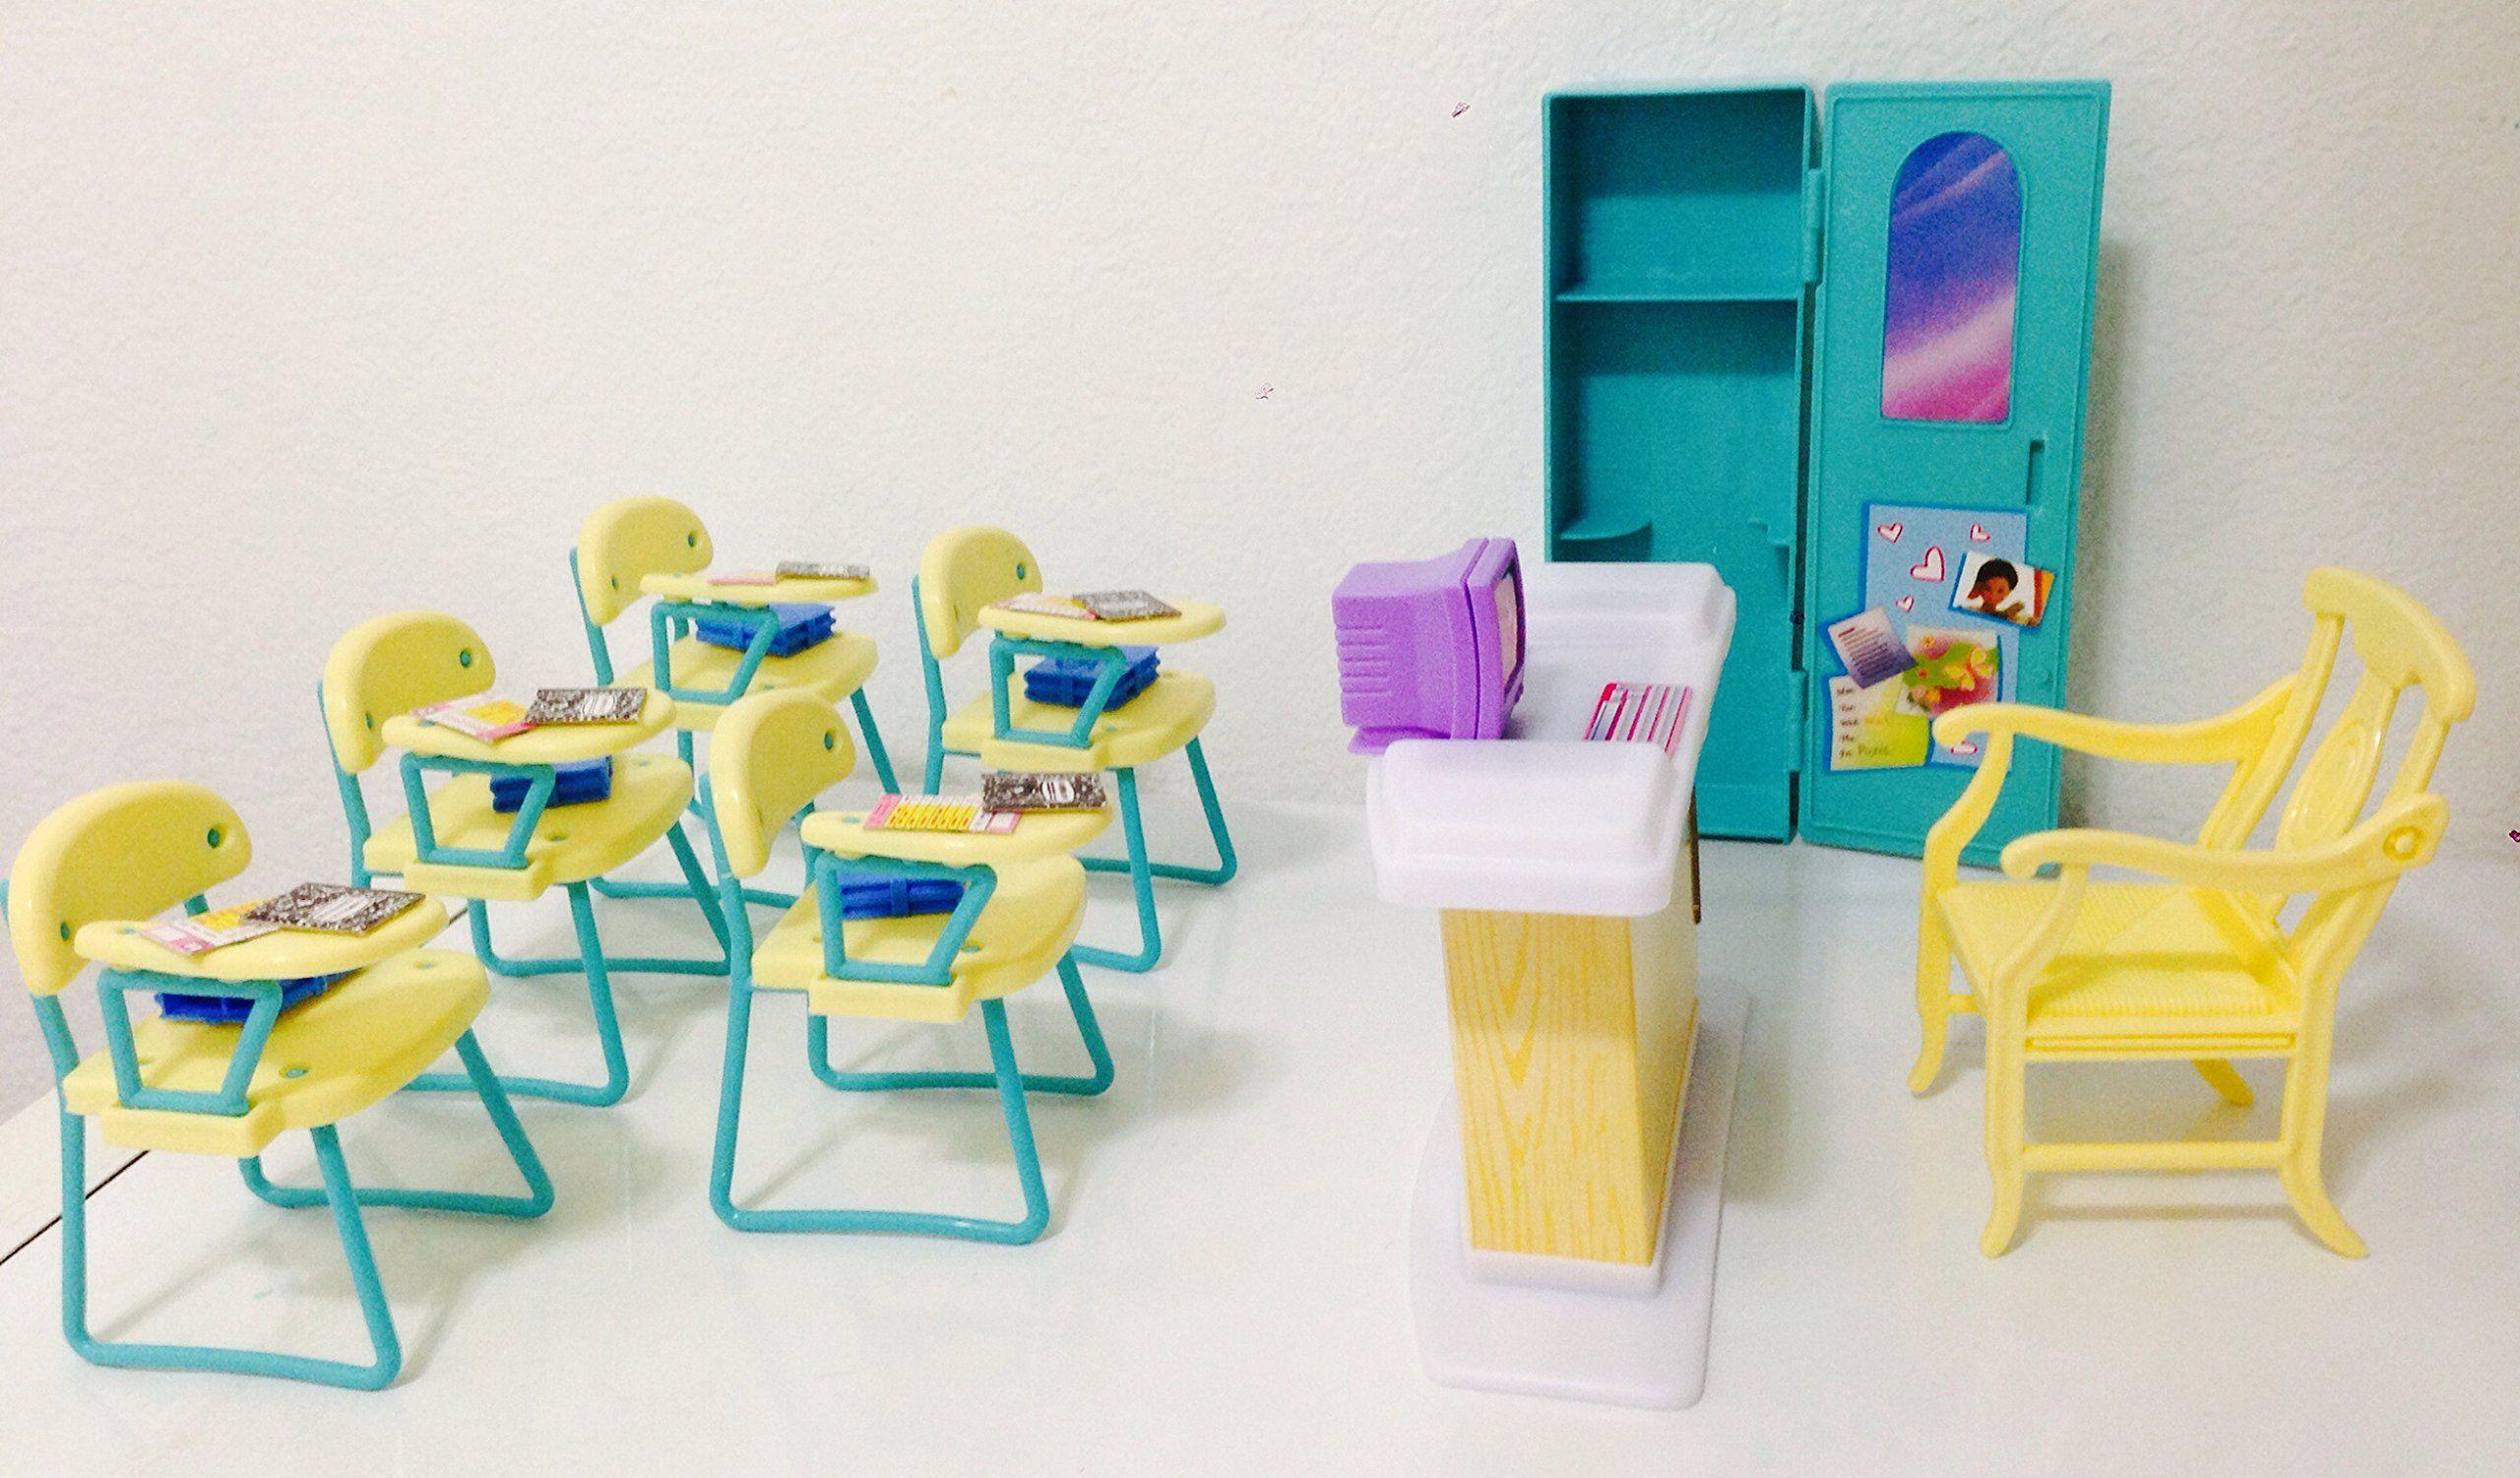 barbie size dollhouse furniture set. Amazon.com: Barbie Size Dollhouse Furniture - Classroom Play Set: Toys \u0026 Games Set U